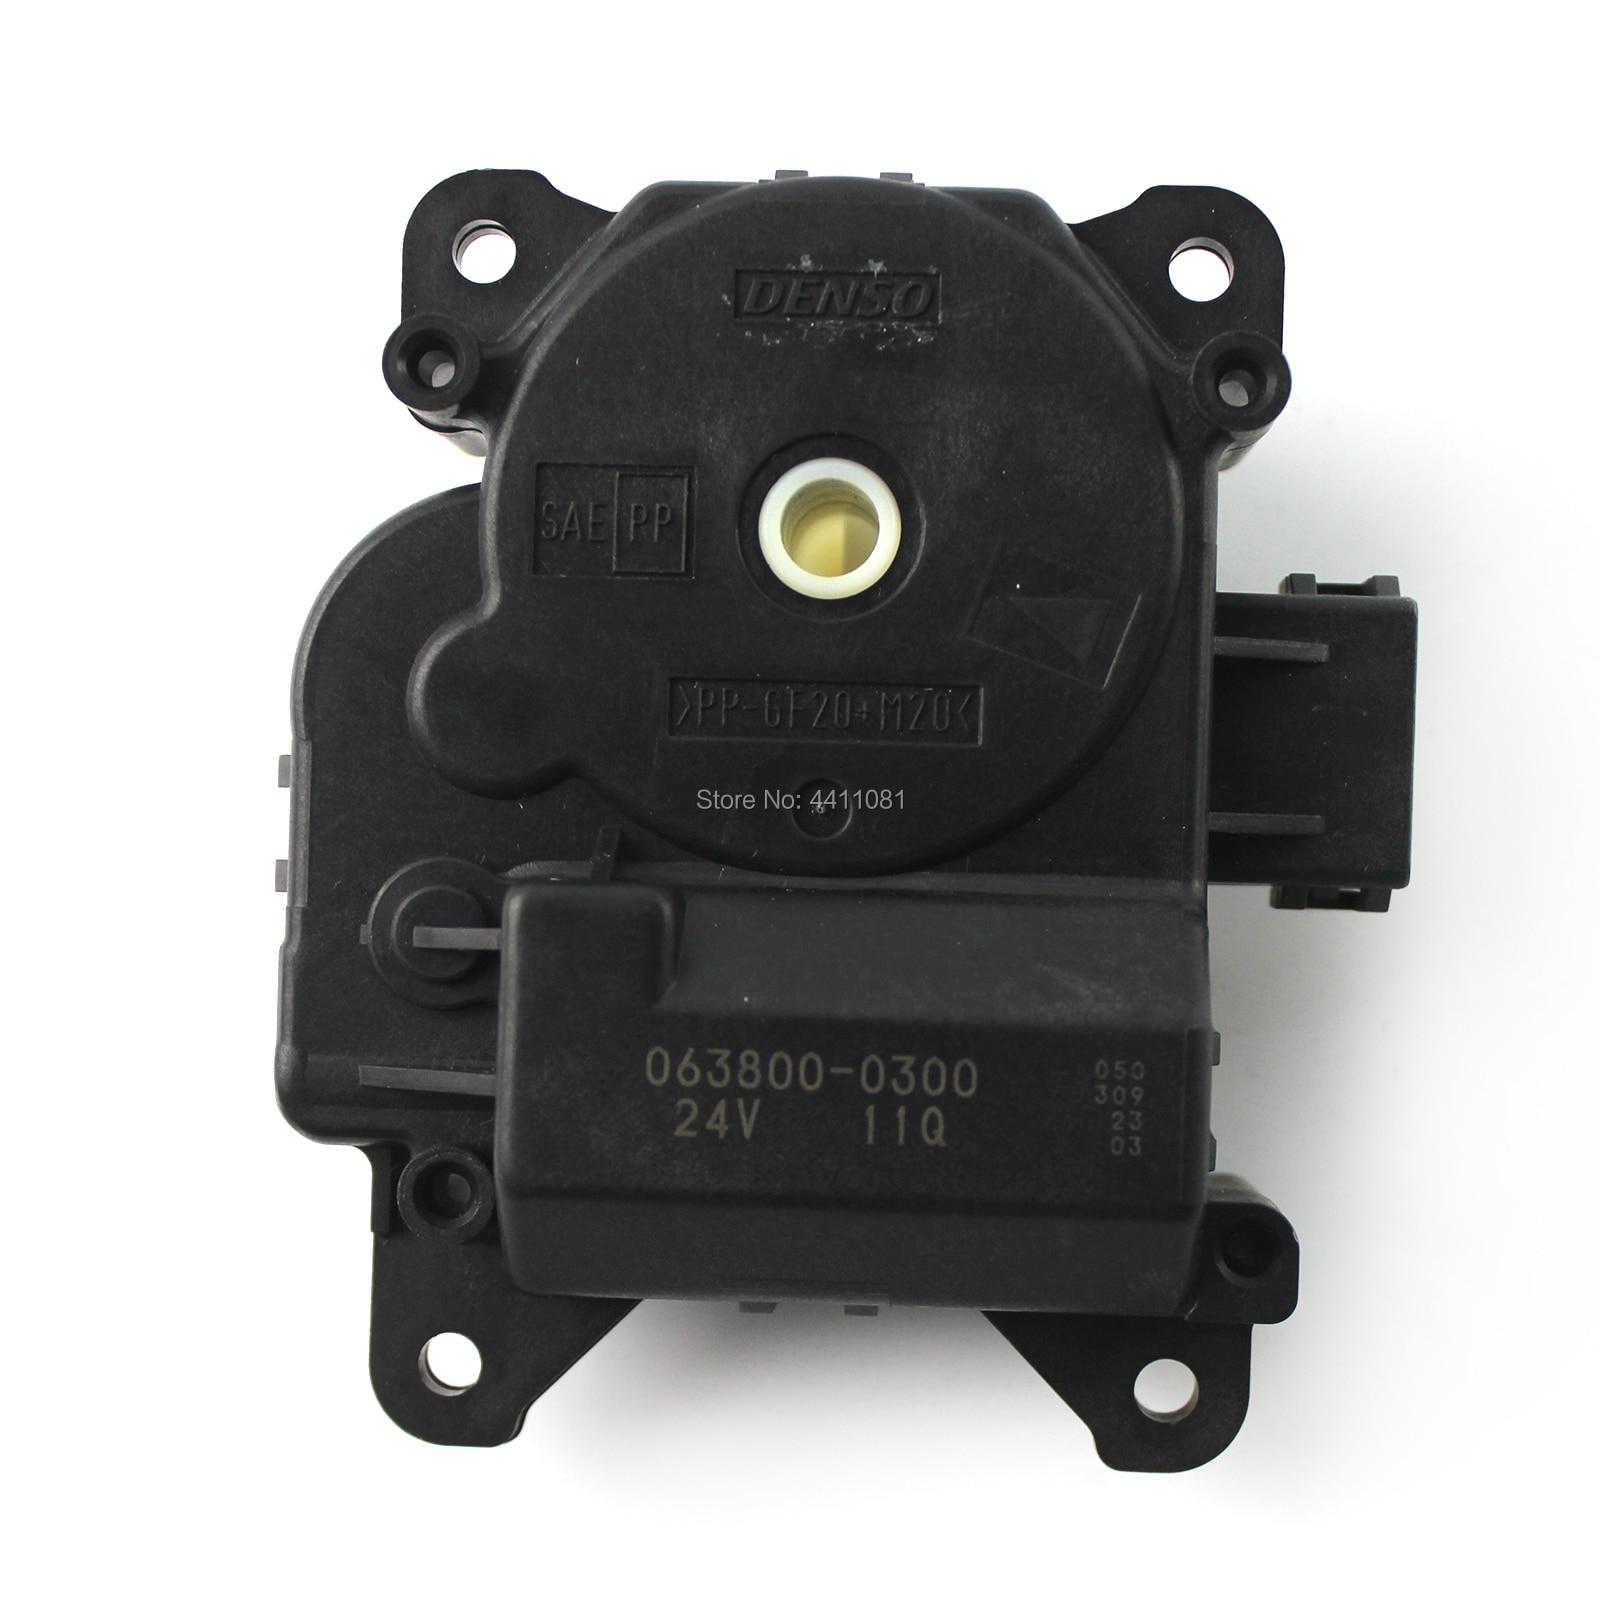 PC210-8 PC88MR-8 PC300-8 PC350LC-8 PC400-8 PC400LC-8 المثبط مضاعفات الفرعية آسى المحرك لكوماتسو ND063800-0300 063800-0300